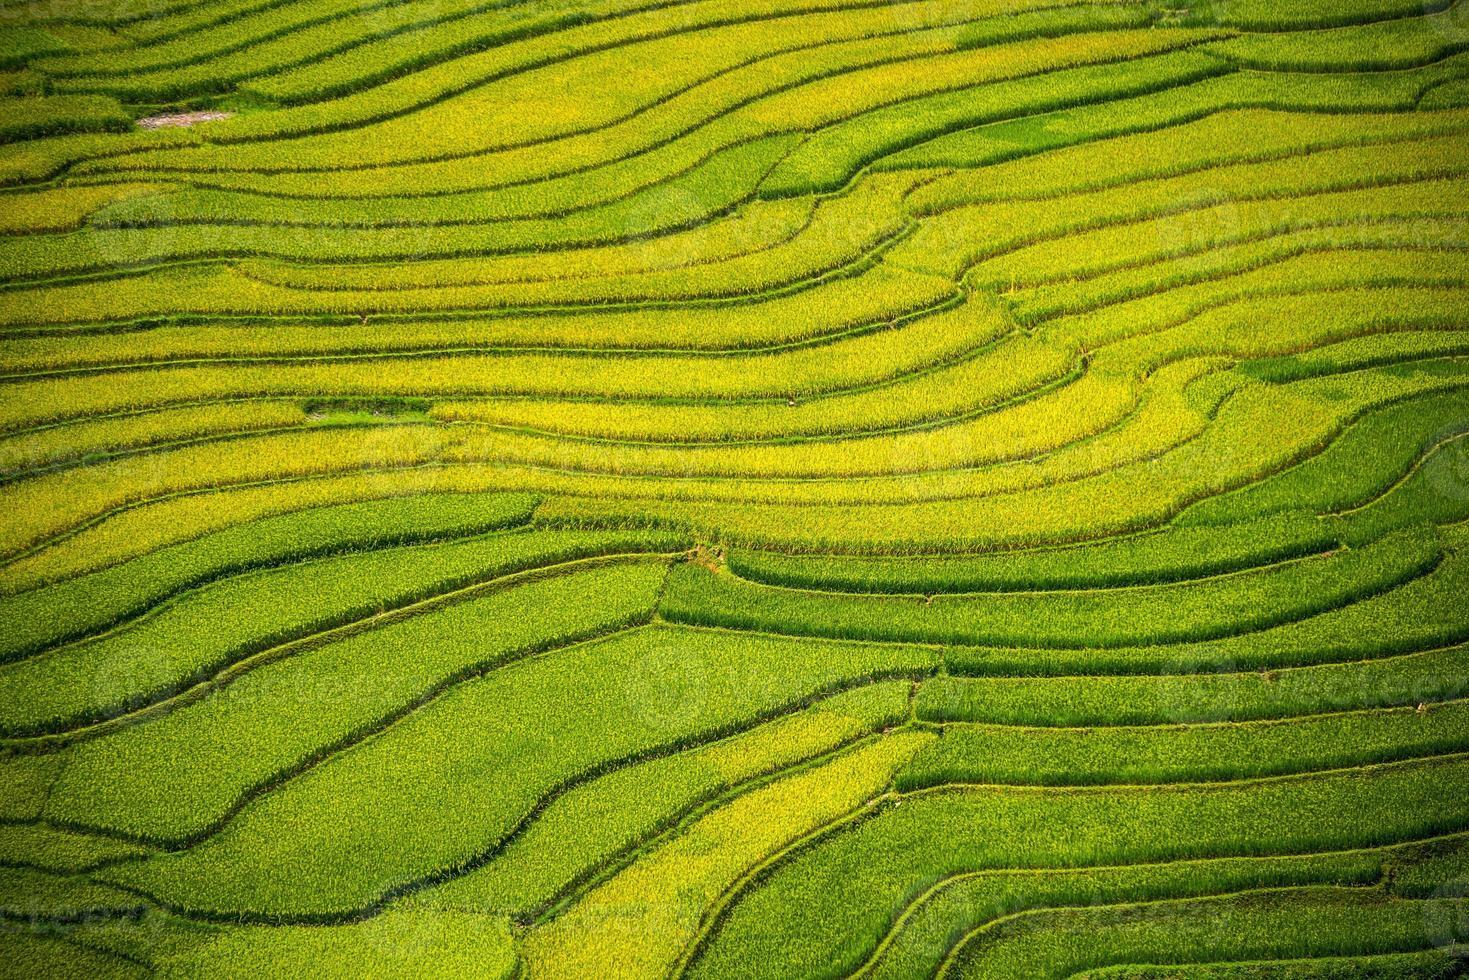 terraza de arroz en vietnam foto